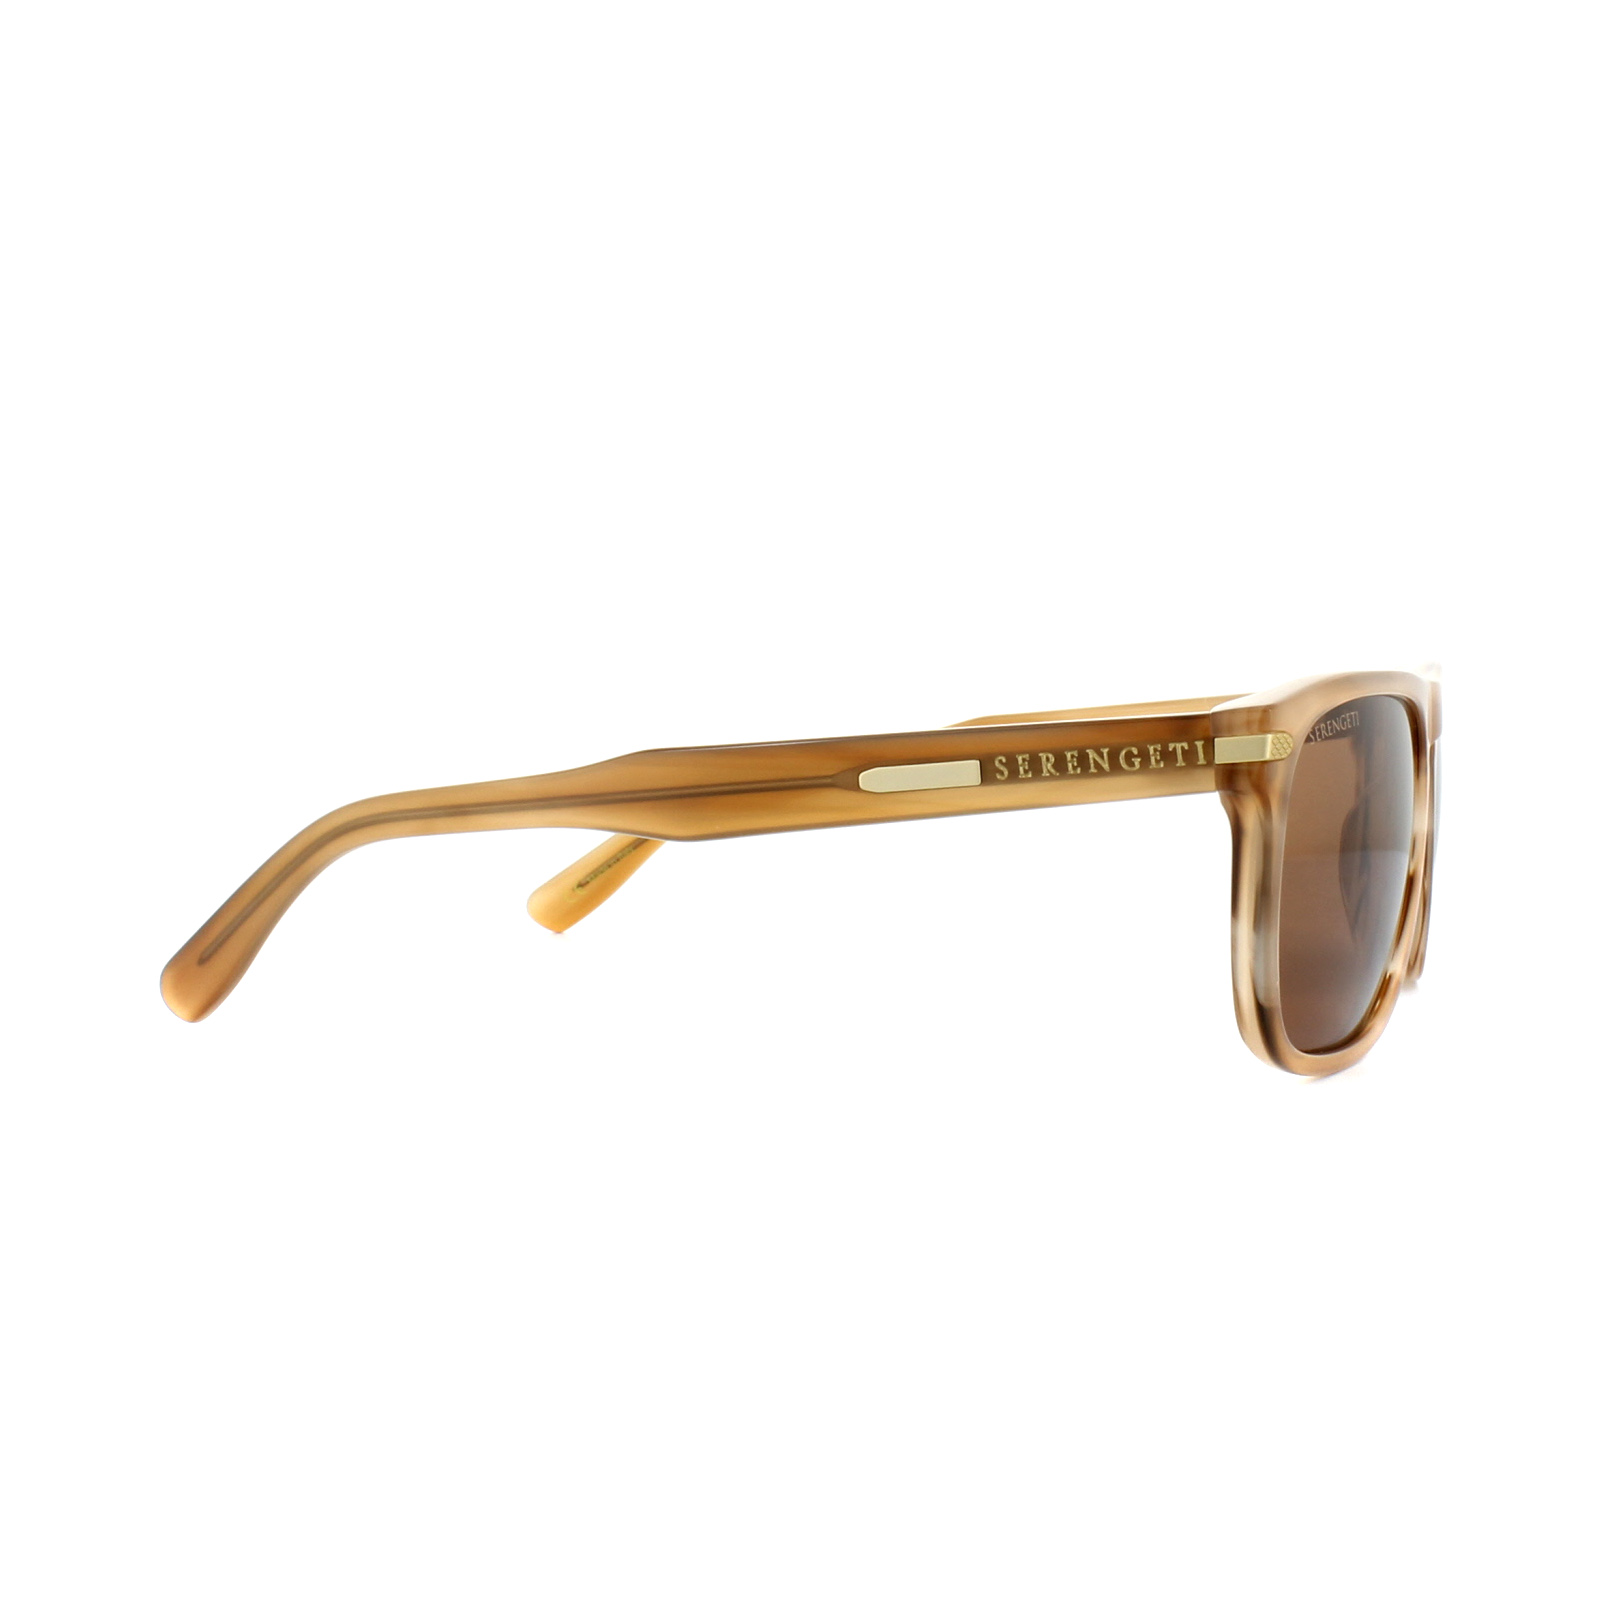 f910890d5ed Sentinel Serengeti Sunglasses Enrico 8152 Crystal Wood Drivers Brown  Polarized